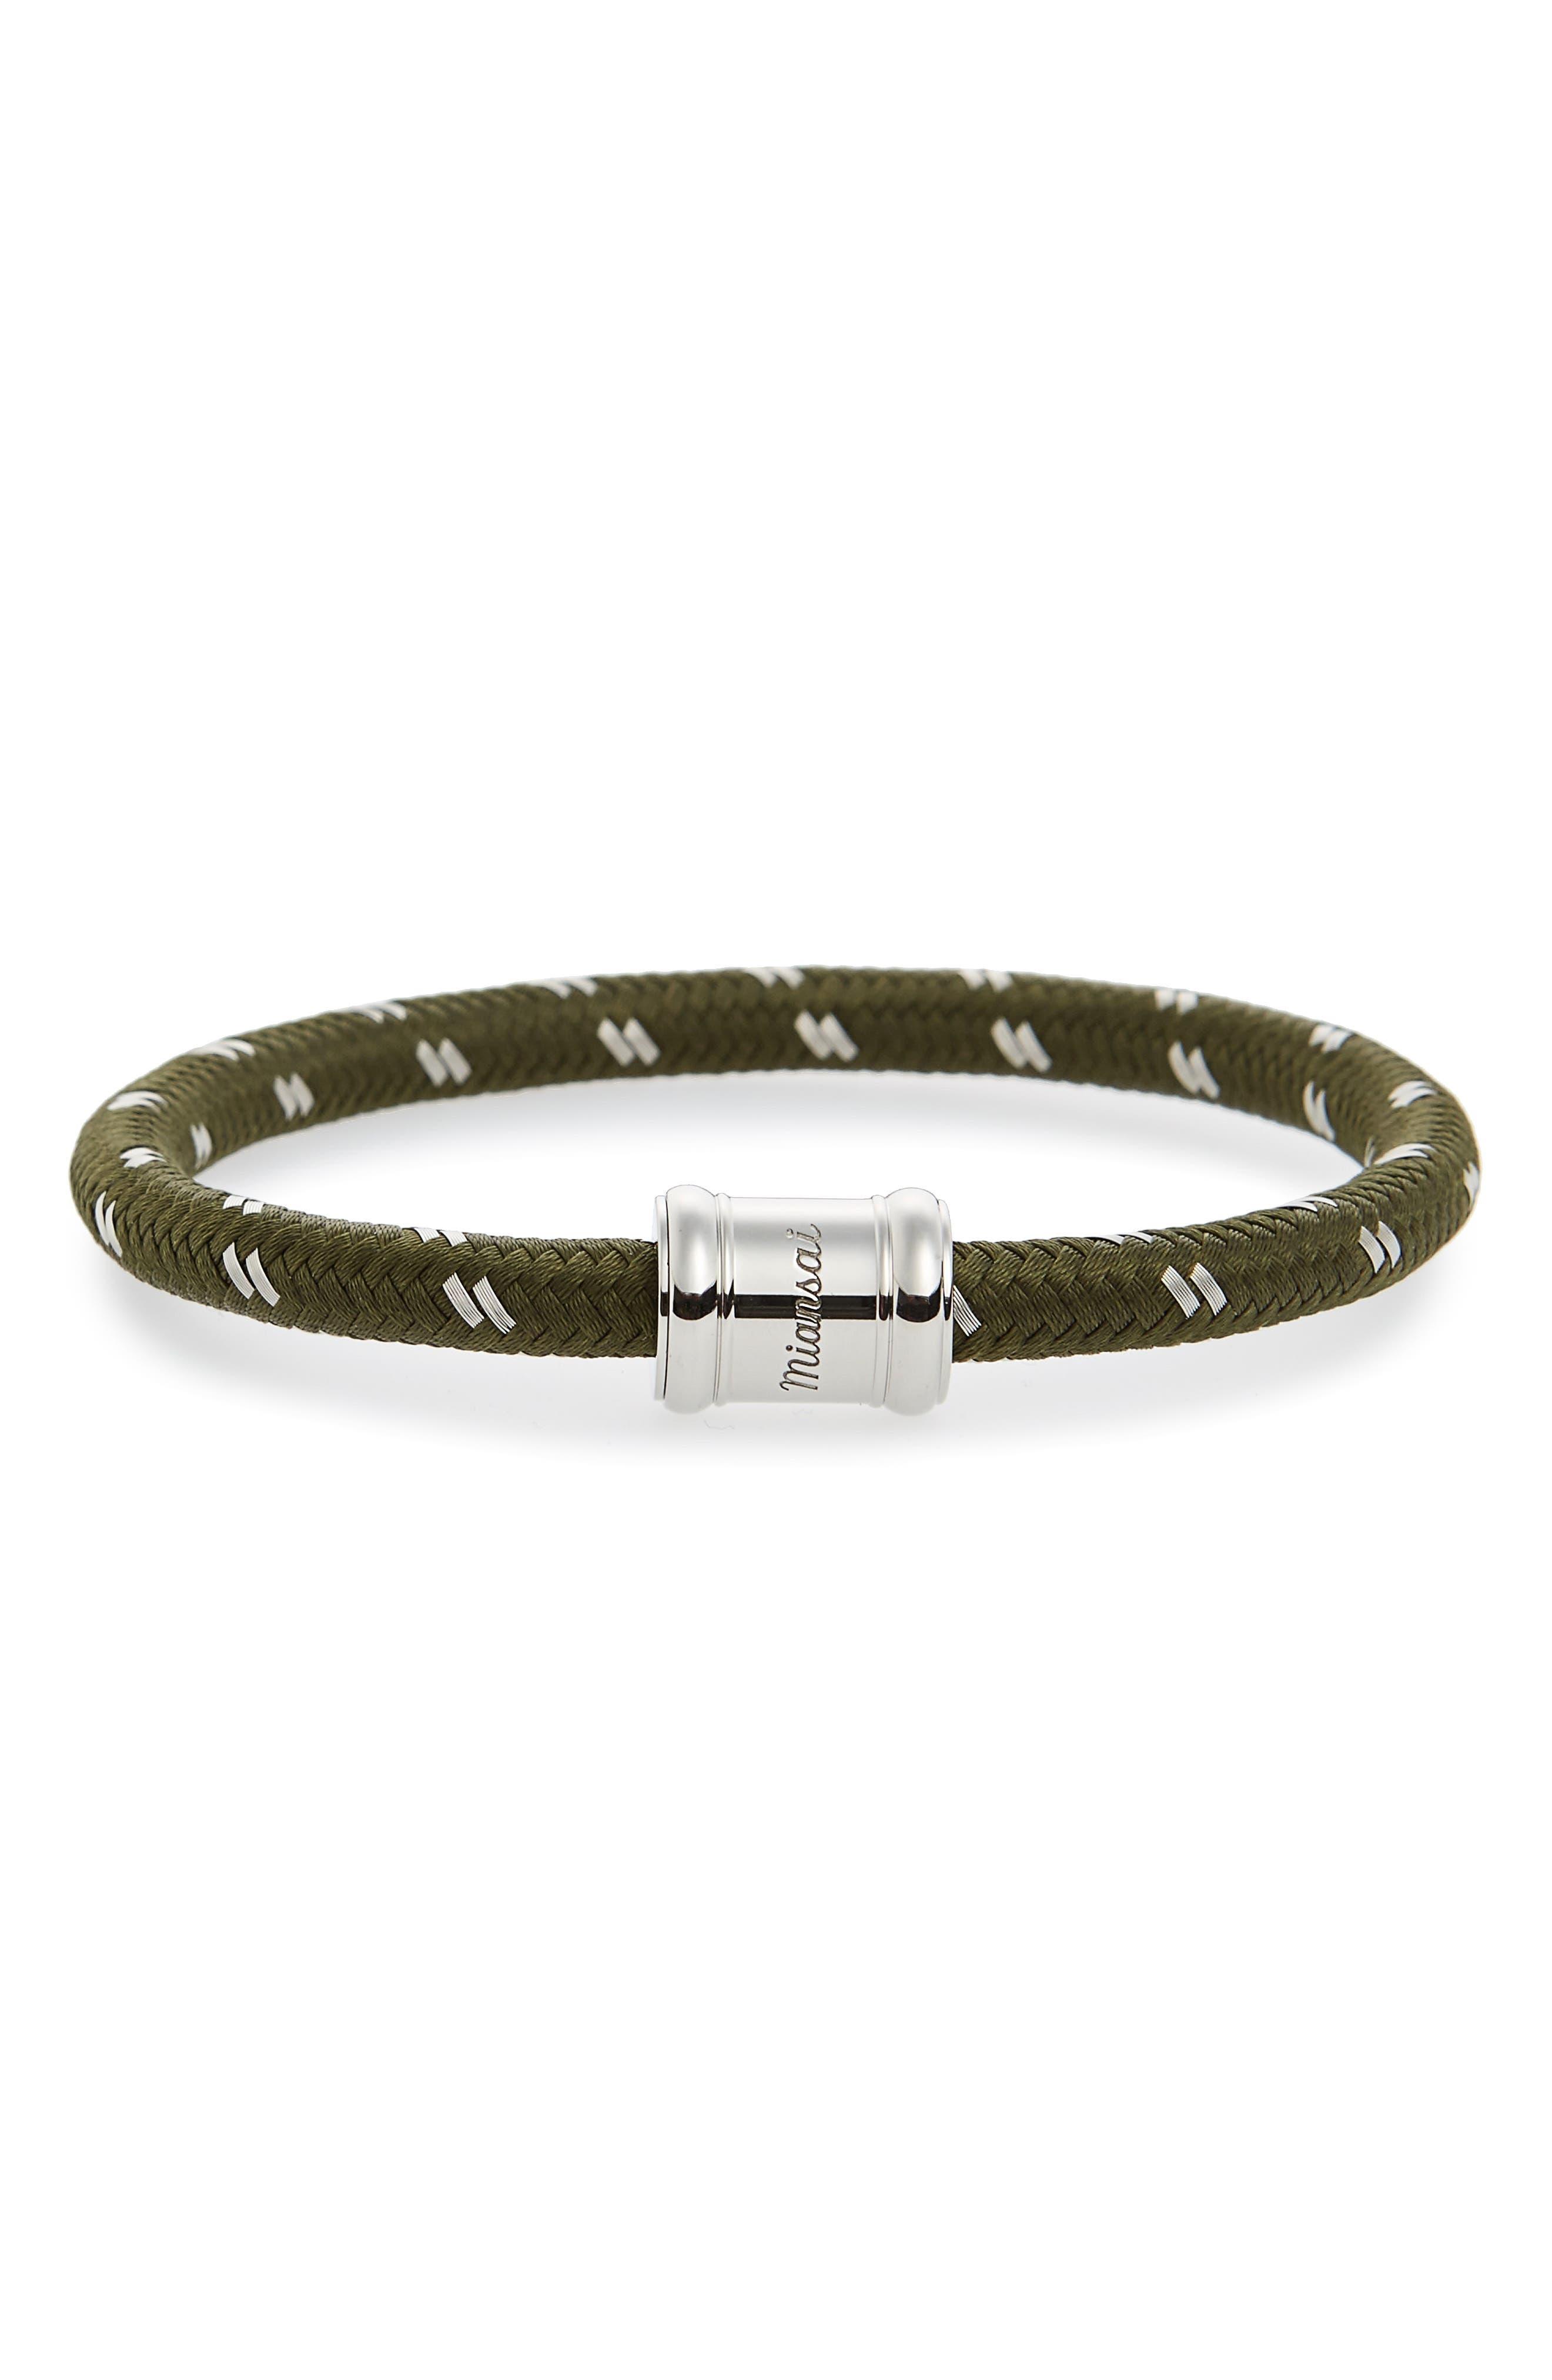 Barrel Casing Nylon Woven Bracelet,                         Main,                         color, Verde/ Steel